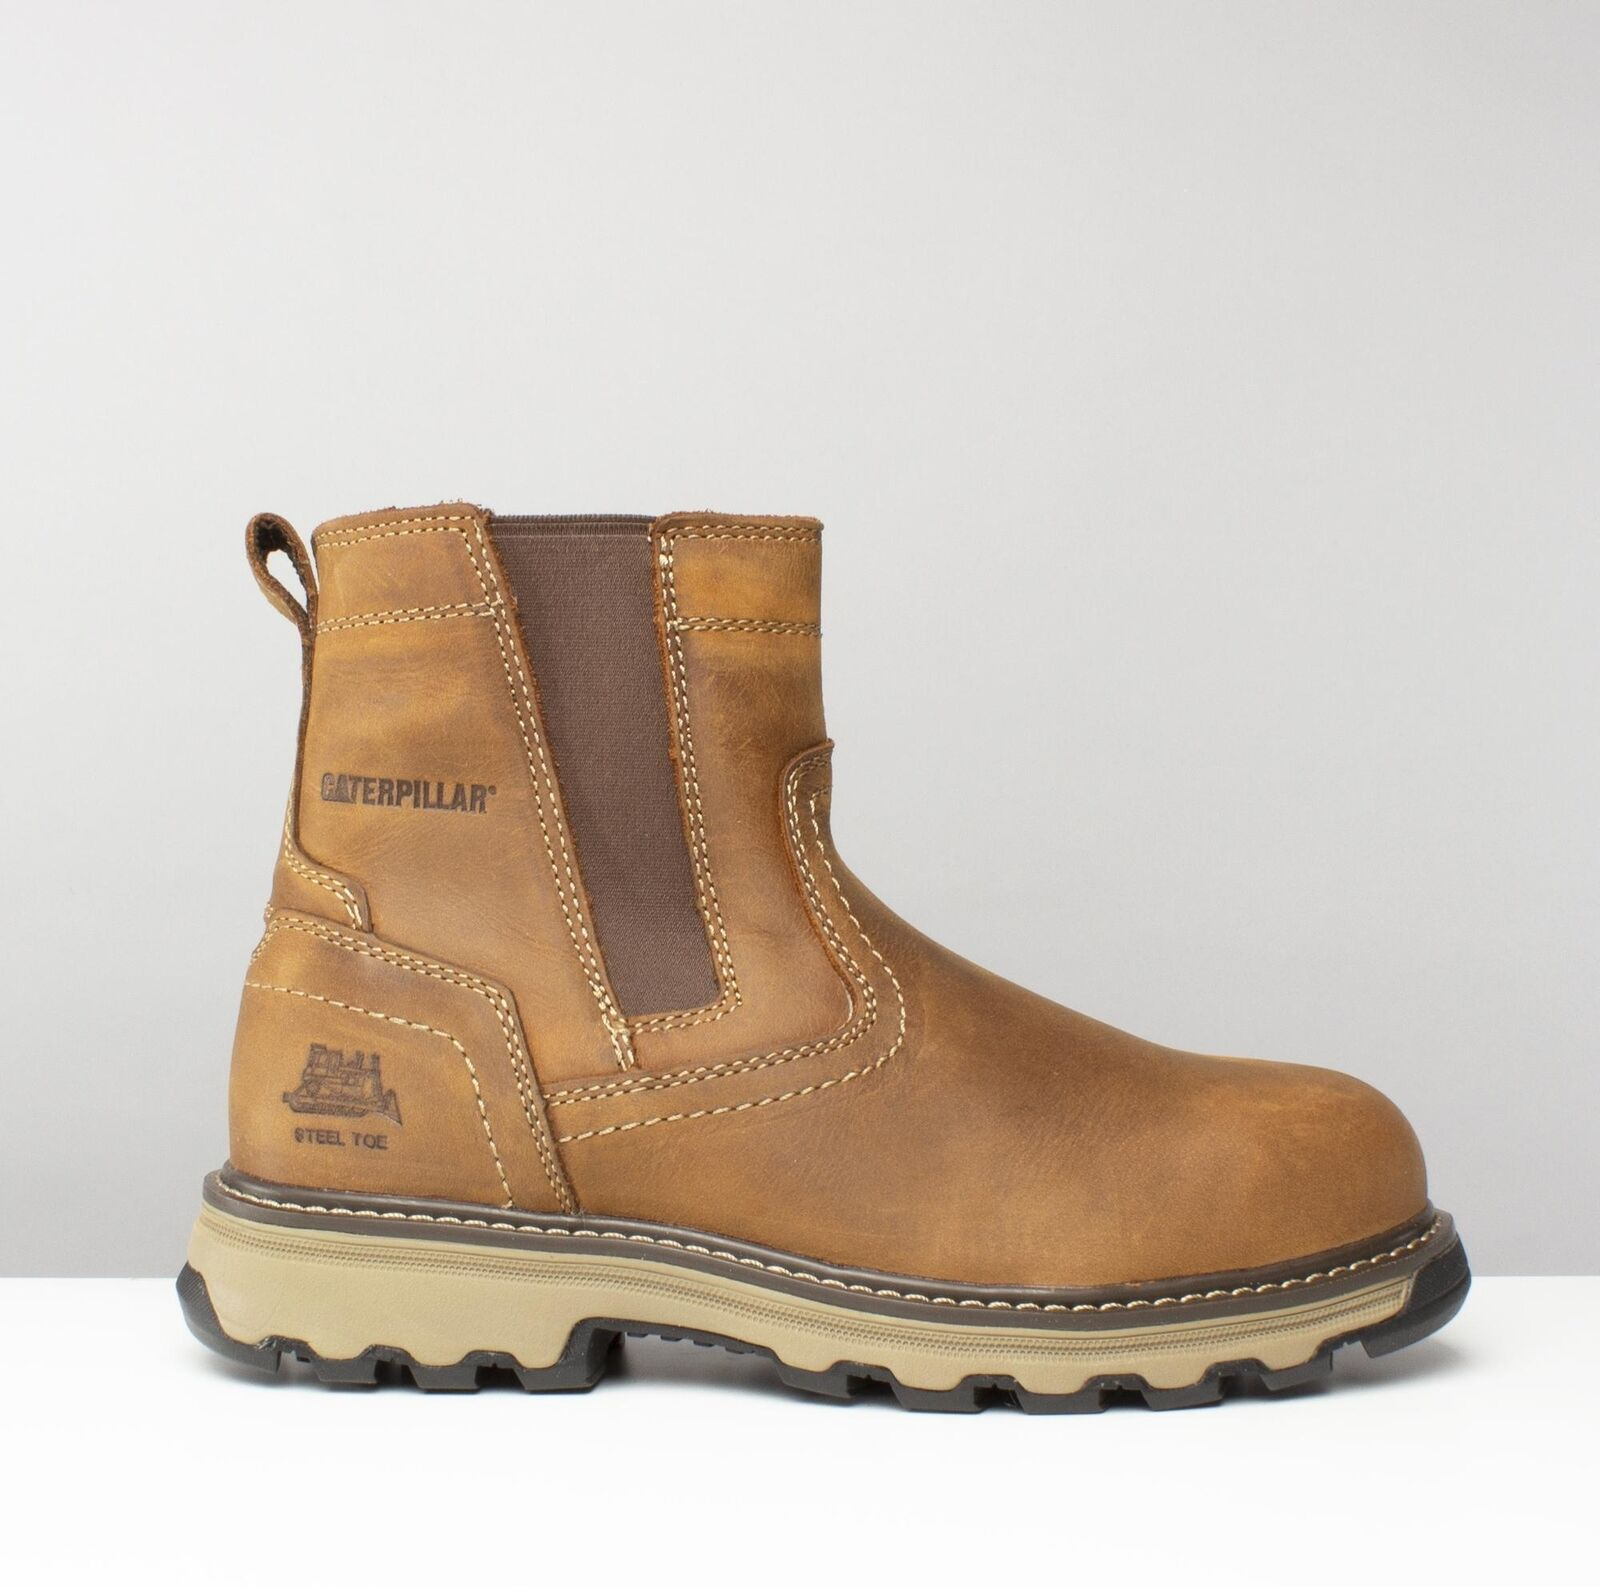 Cat ® PELTON Mens Leather S1 P HRO SRA Dealer Steel Toe Safety Boots Beige